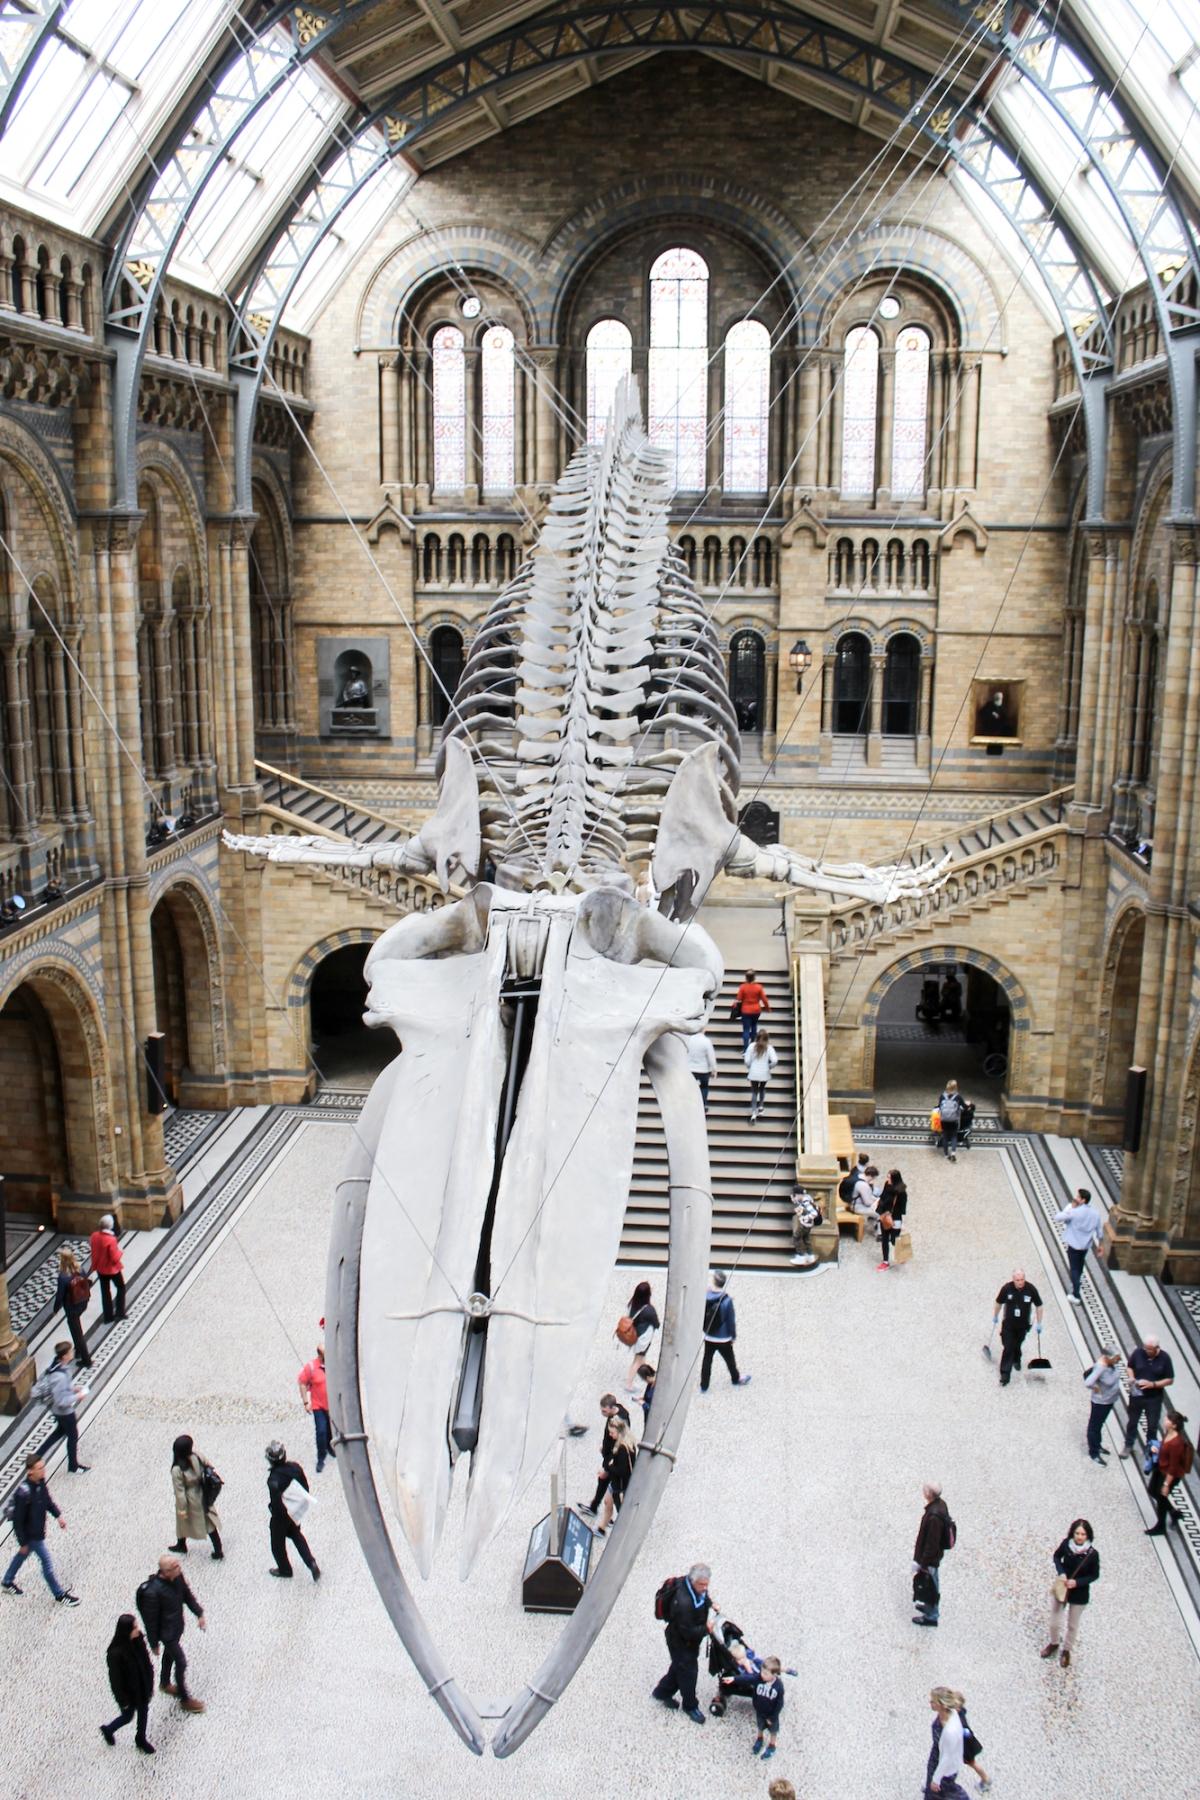 London Natural History Museum, South Kensington, museum, London, United Kingdom